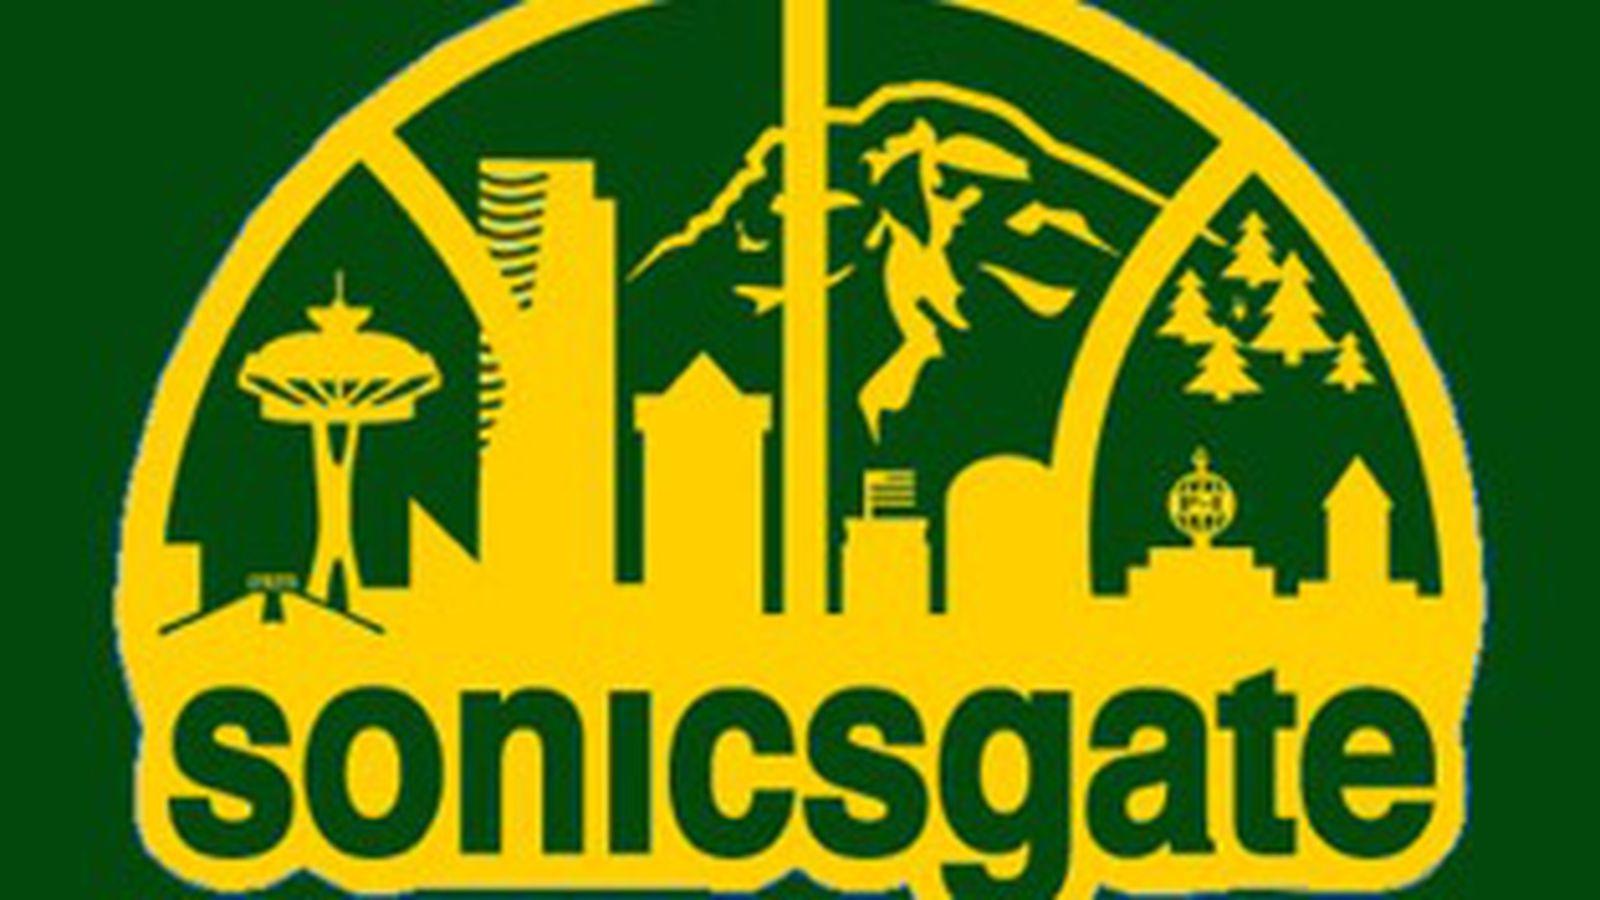 Sonicsgate (2009) - Jason Reid | Related | AllMovie